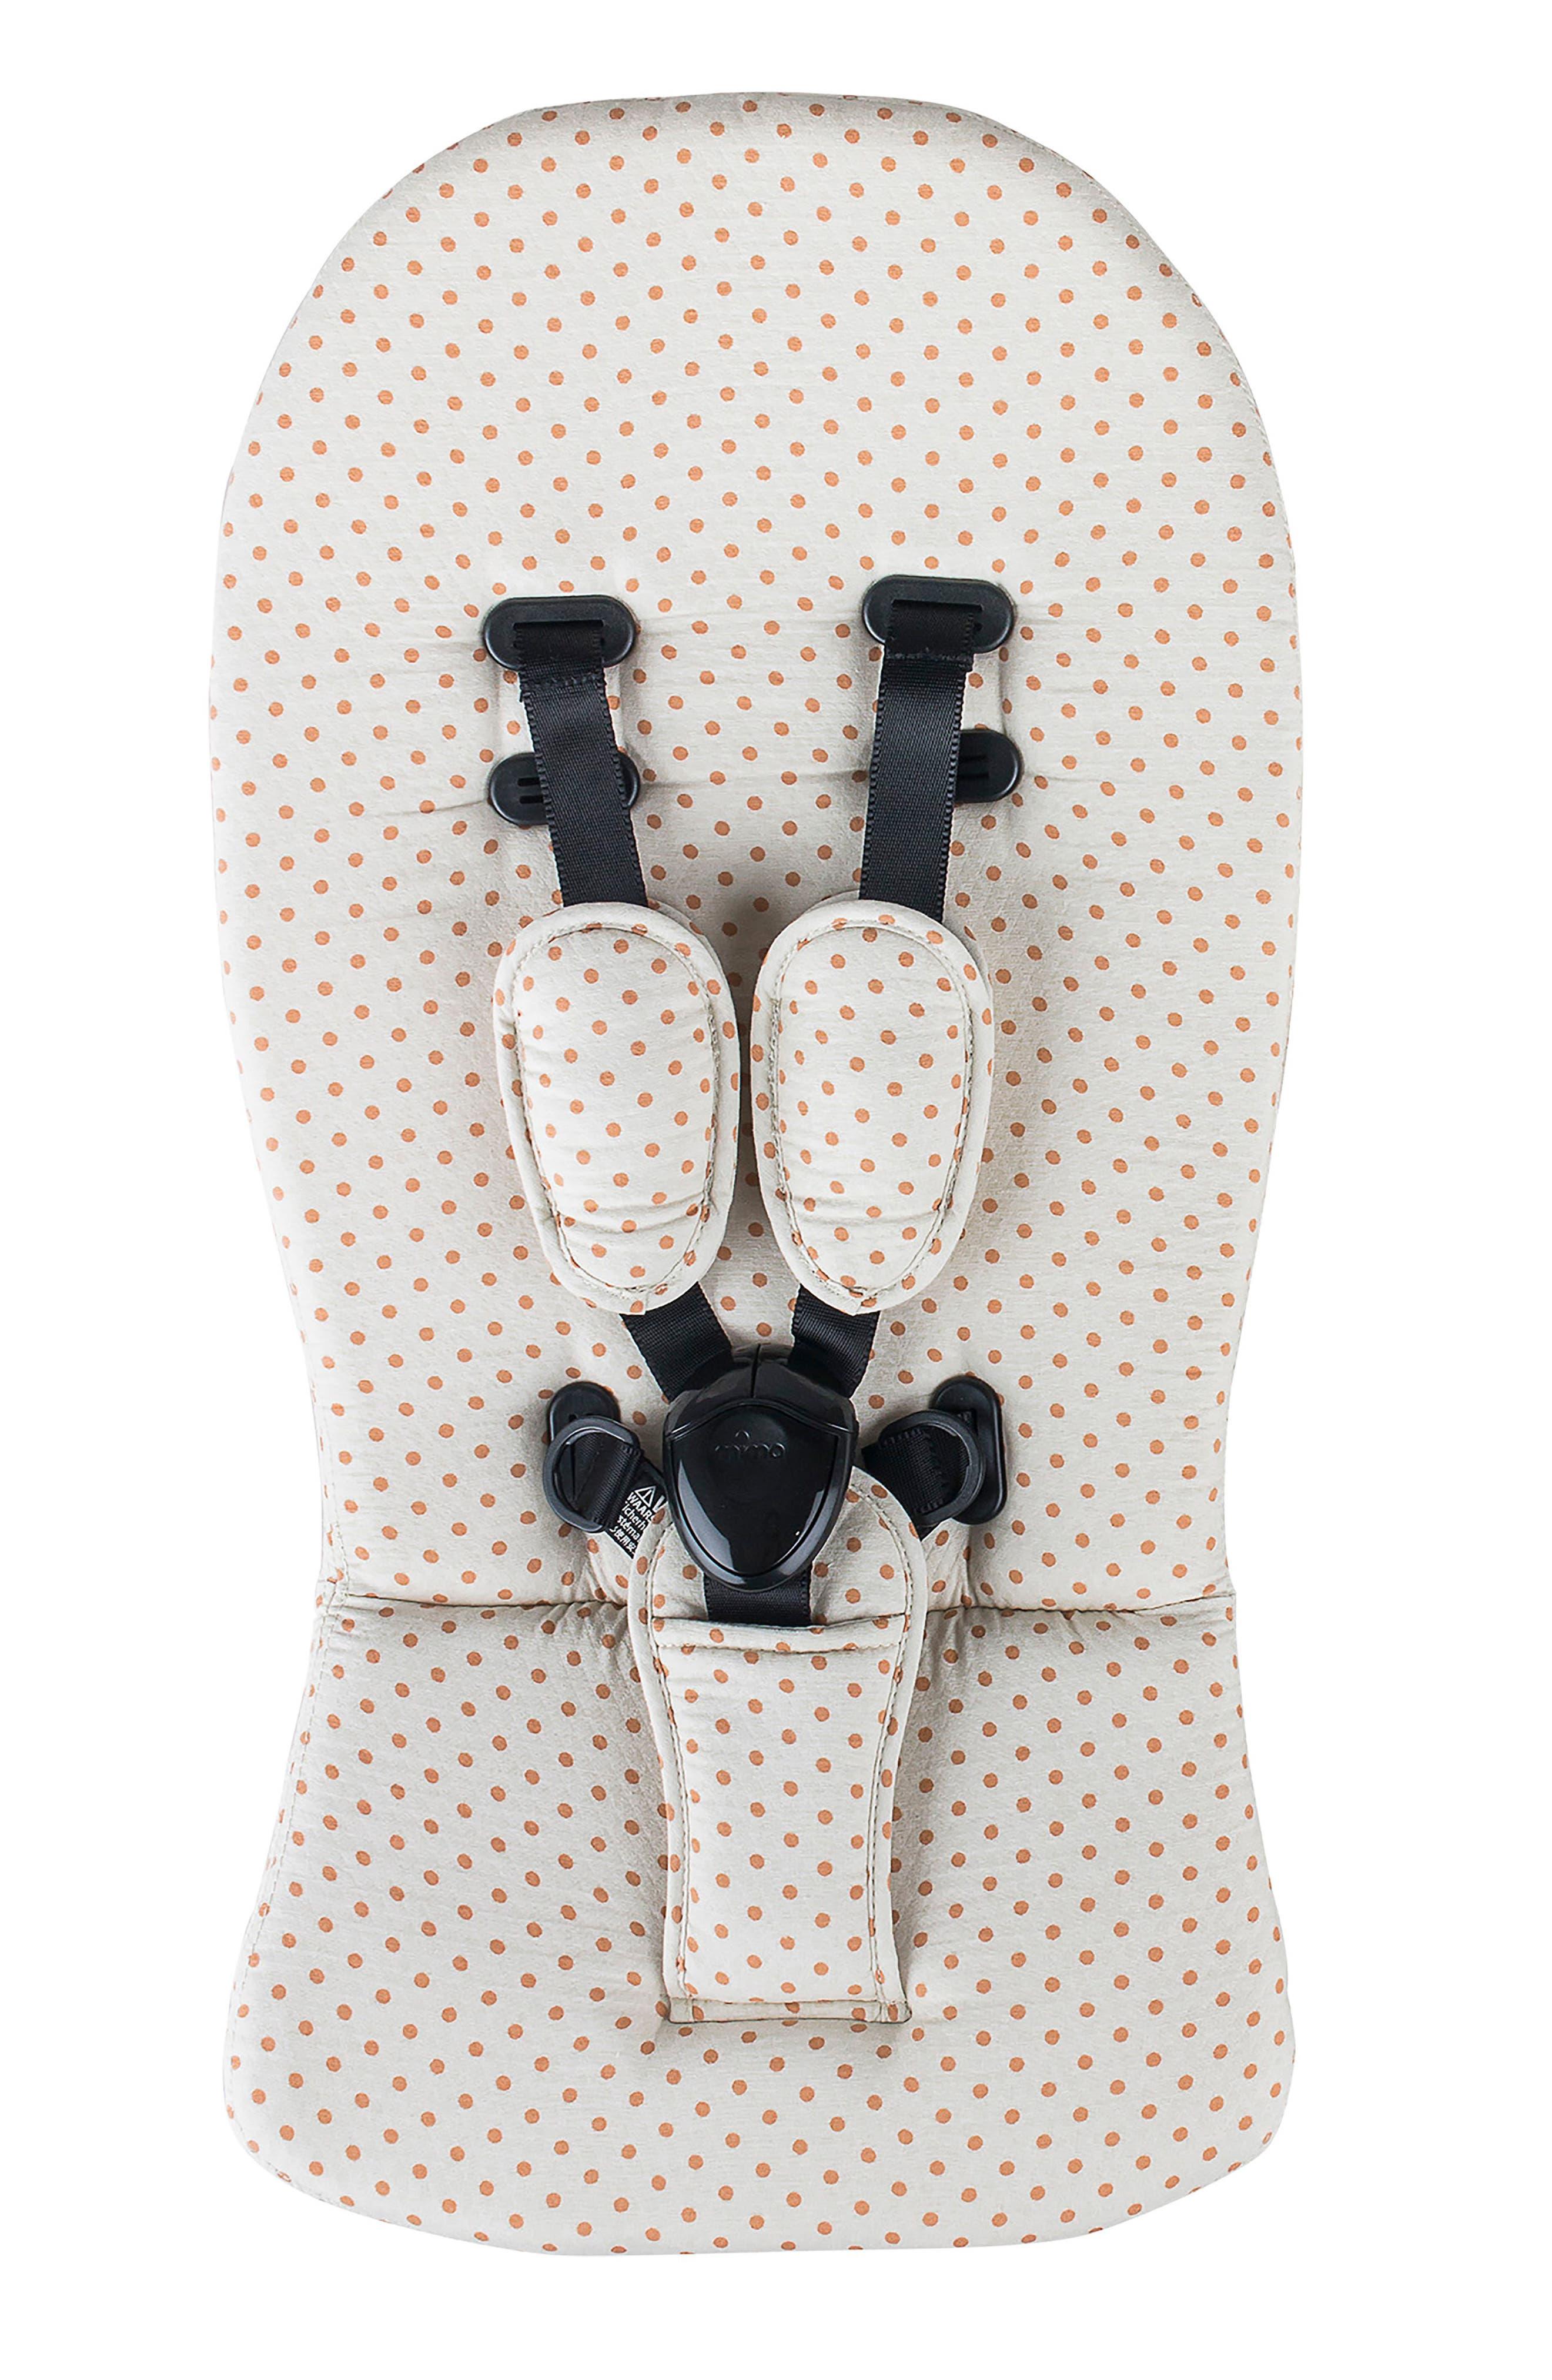 Alternate Image 1 Selected - Mima Comfort Padding Kit for Mima Xari or Kobi Strollers